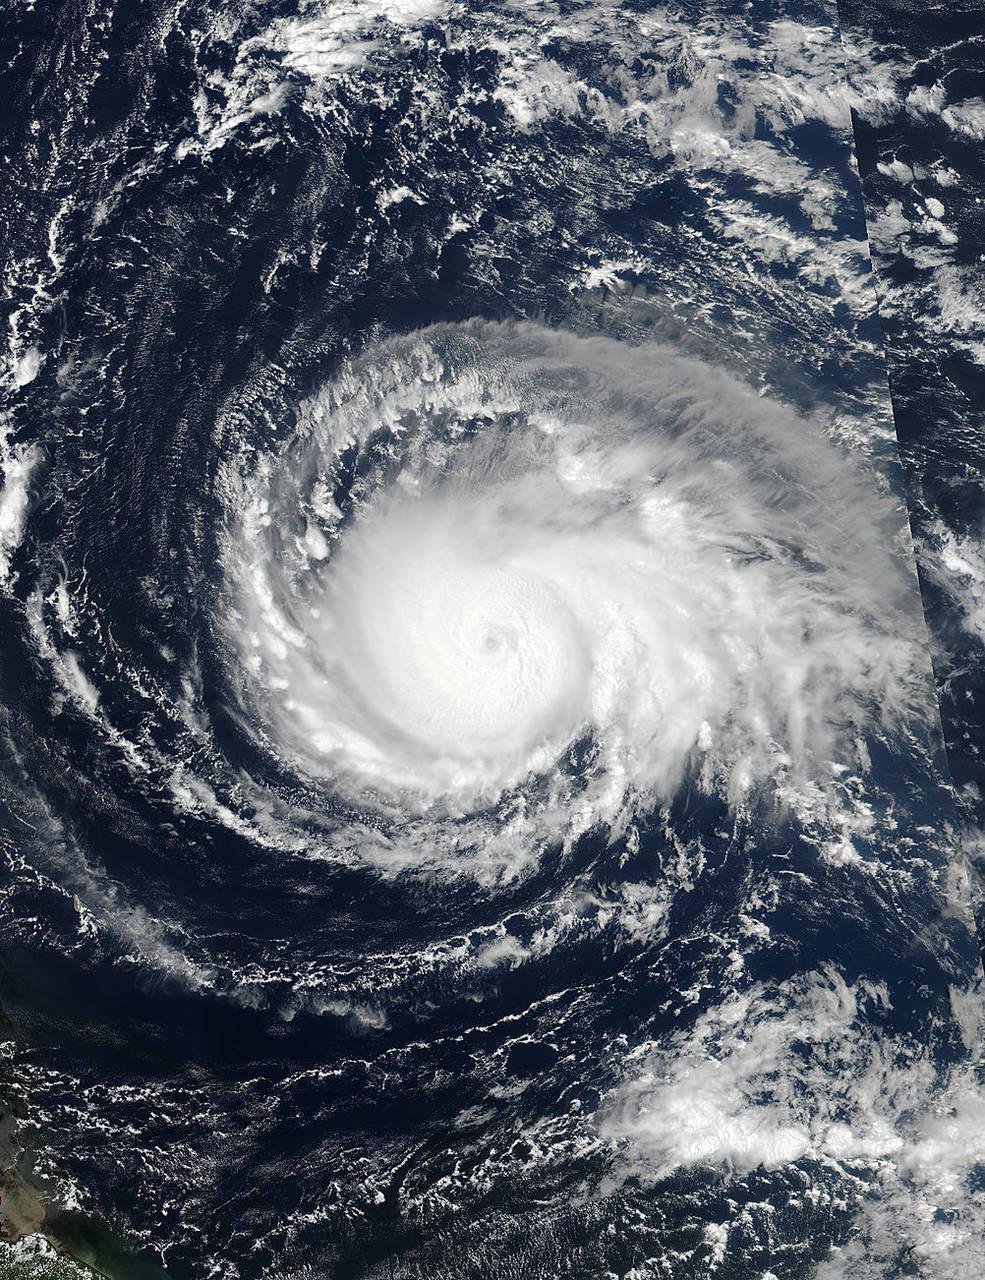 Ураган «Ирма», приближающийся к побережью США